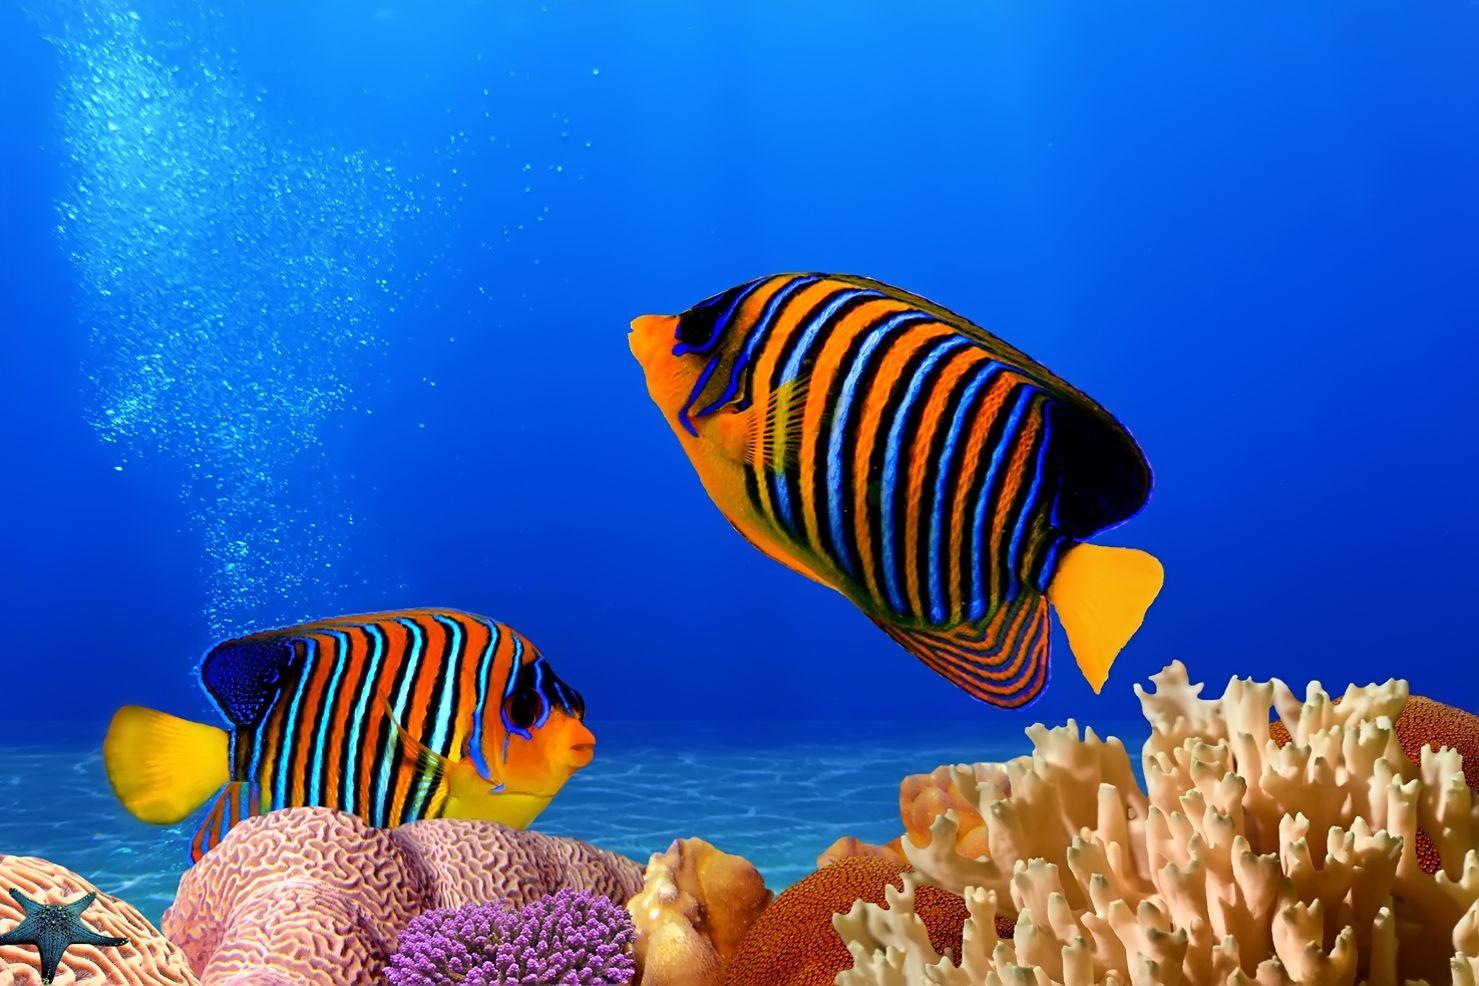 Hermosa Arrecifes De Coral Para Colorear E Imprimir Viñeta ...